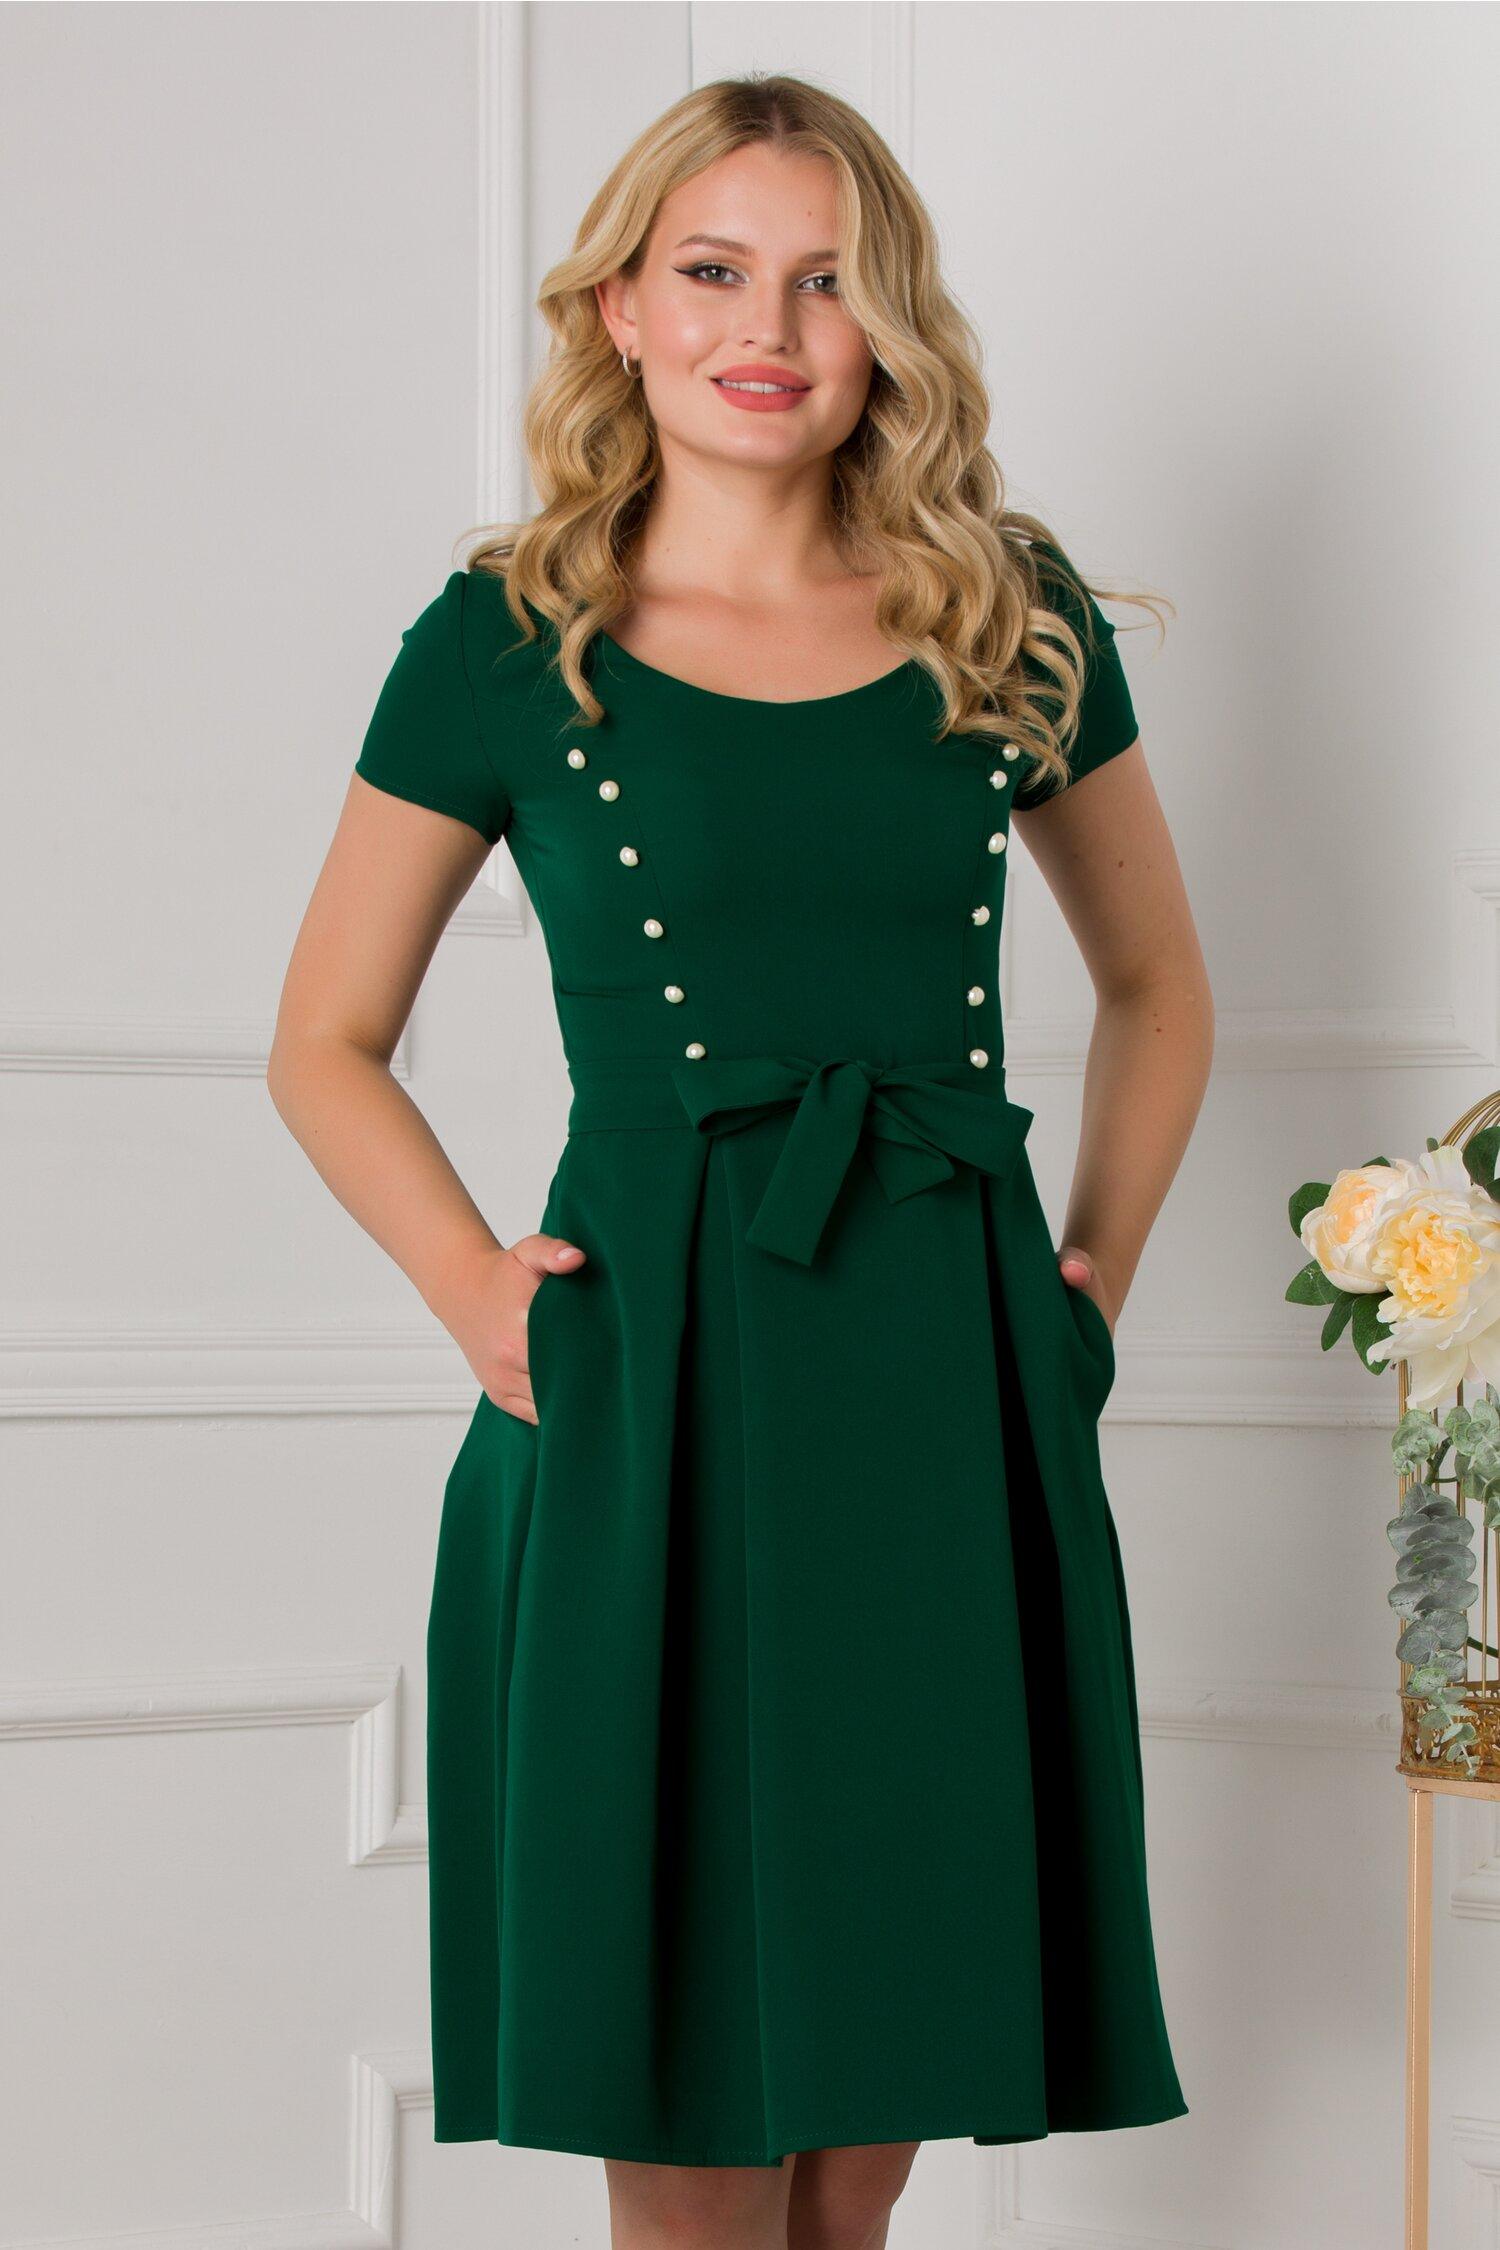 Rochie Erika verde accesorizata cu nasturasi albi perlati imagine